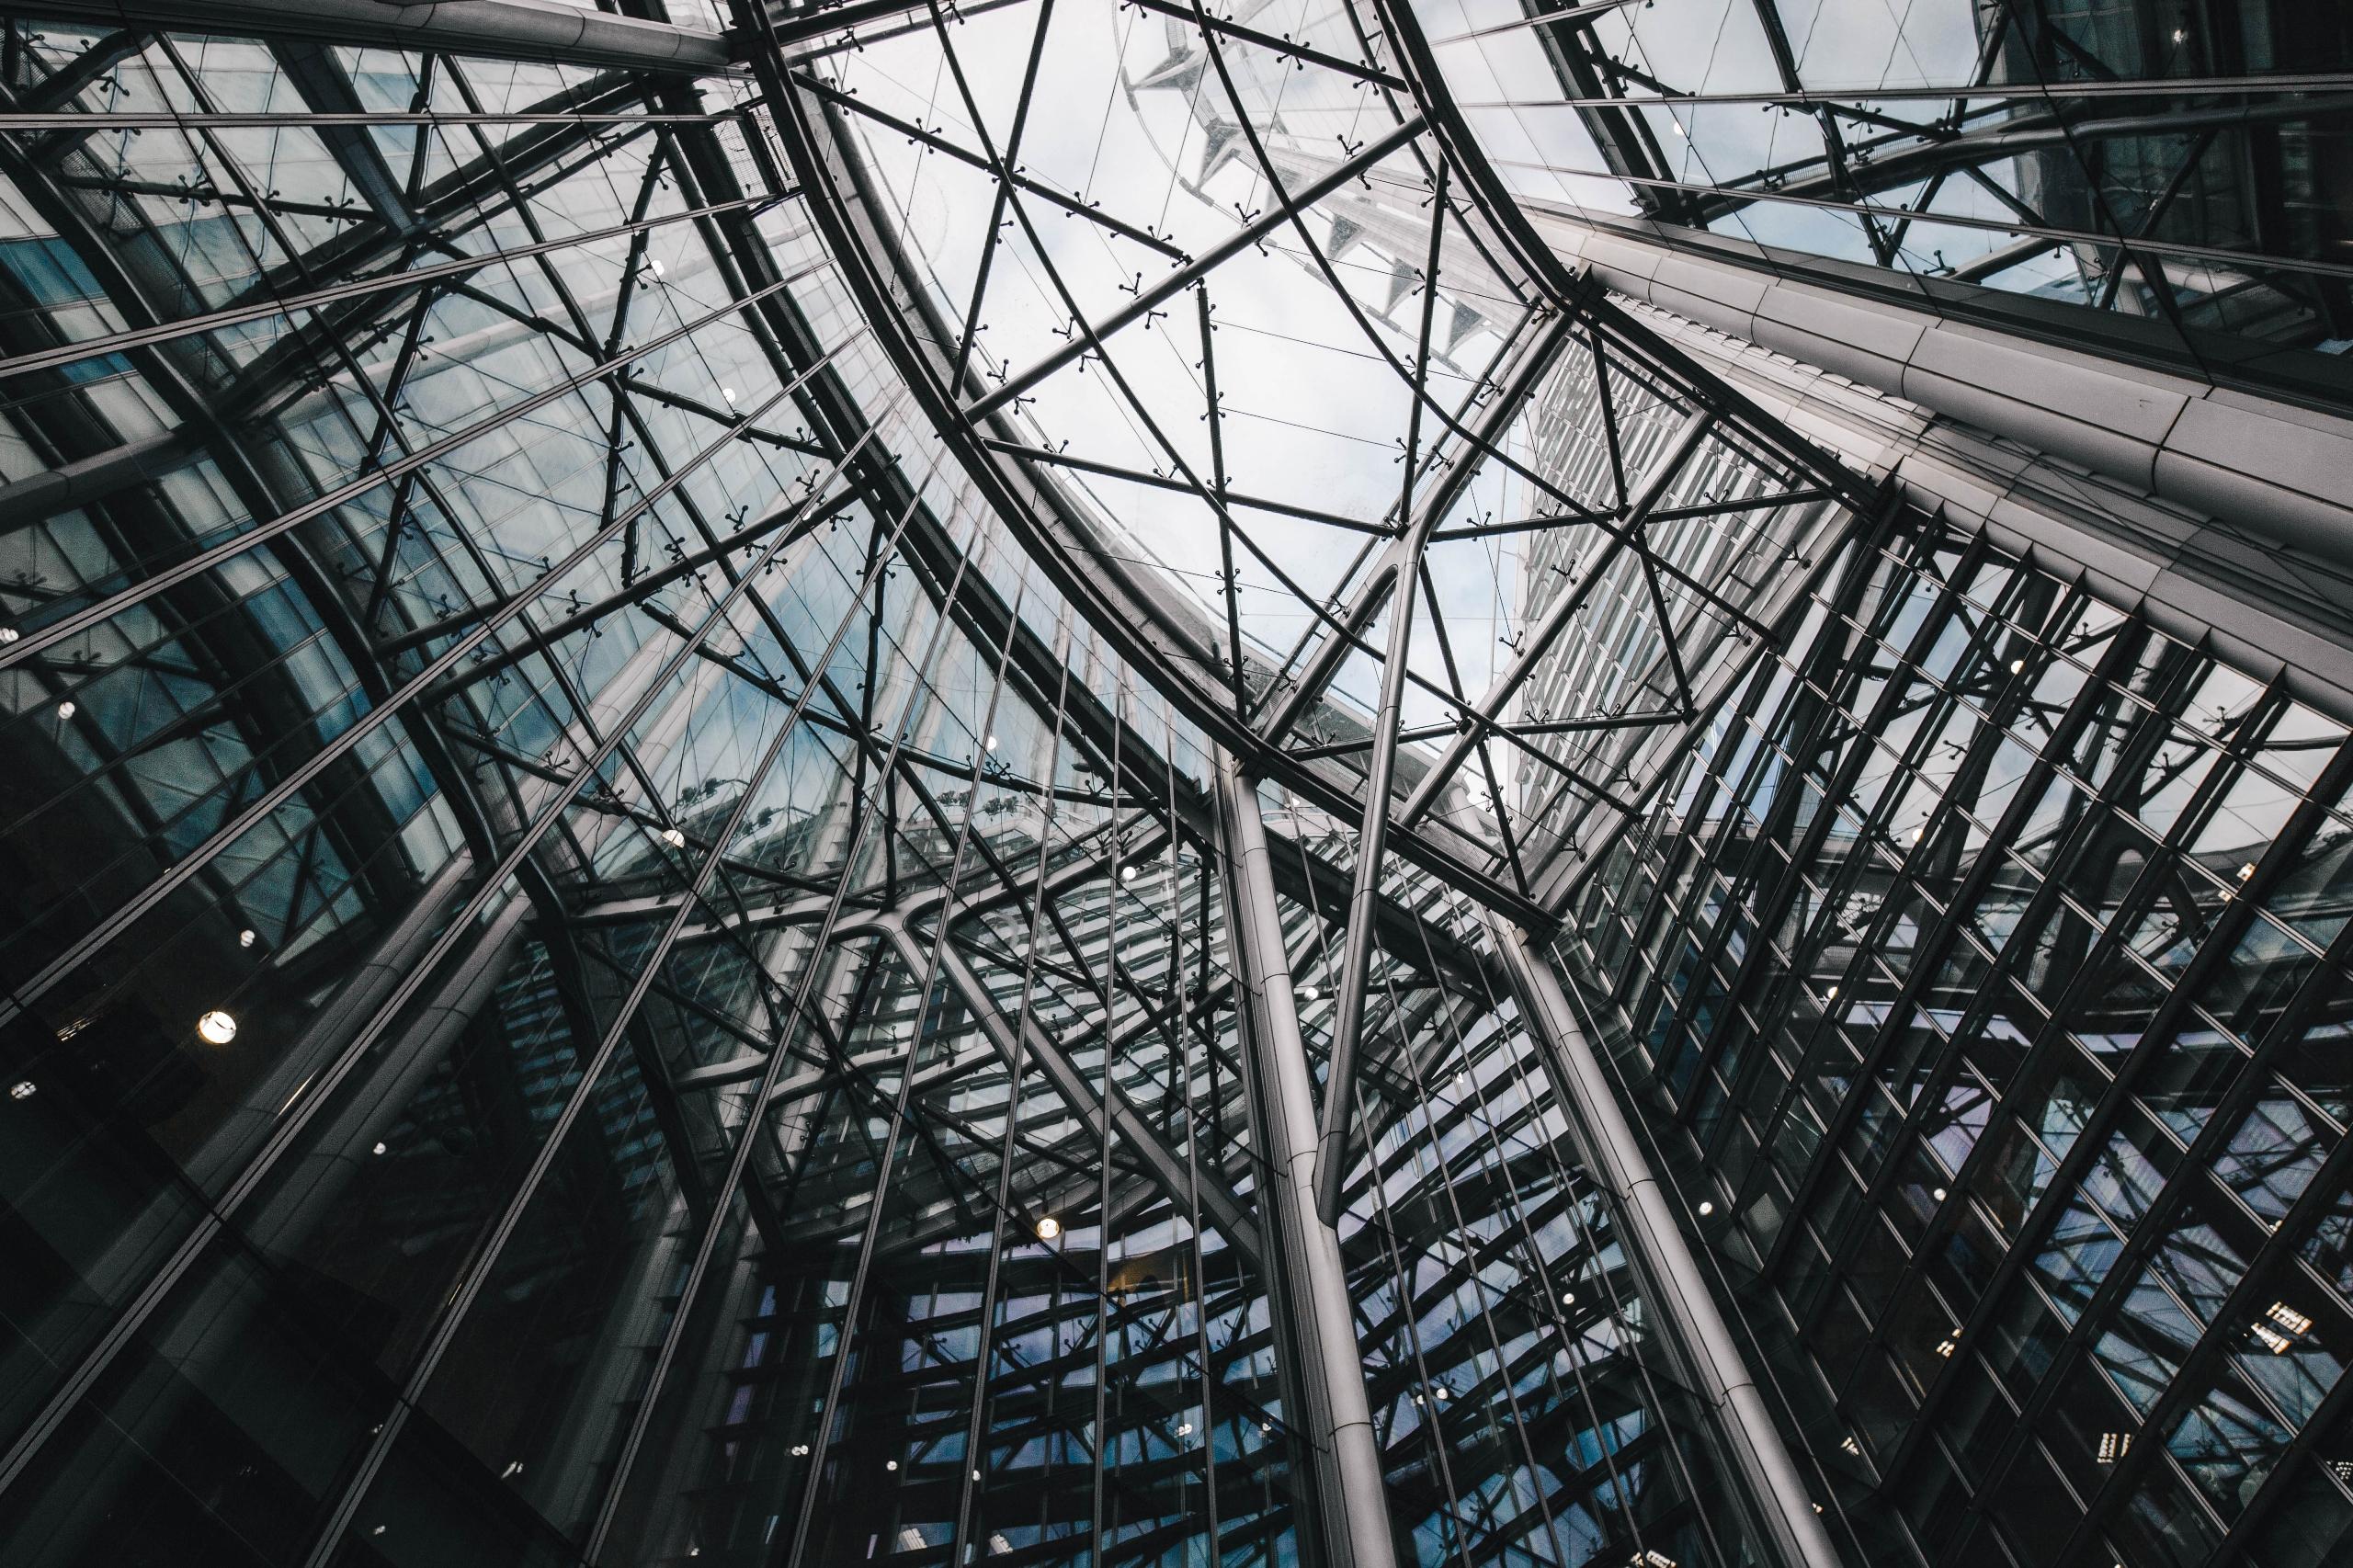 Superstructure - architecture, london - domreess | ello